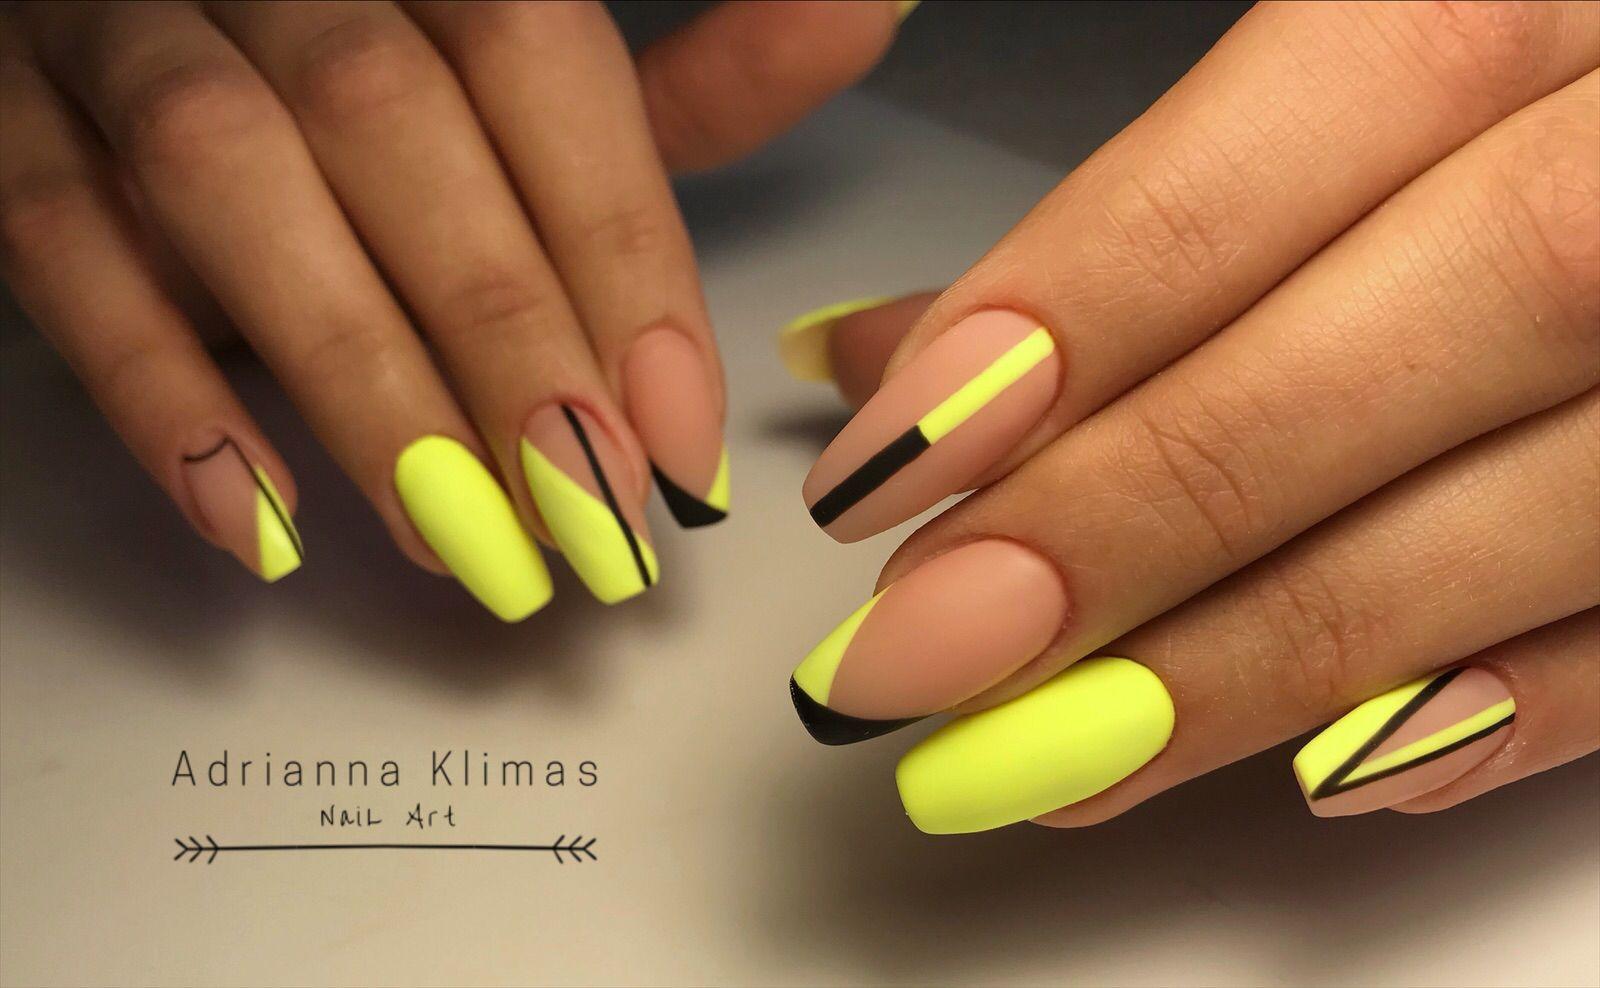 Yellownails Mattenails Geometricnails Design Nehtu Gelove Nehty Nehty